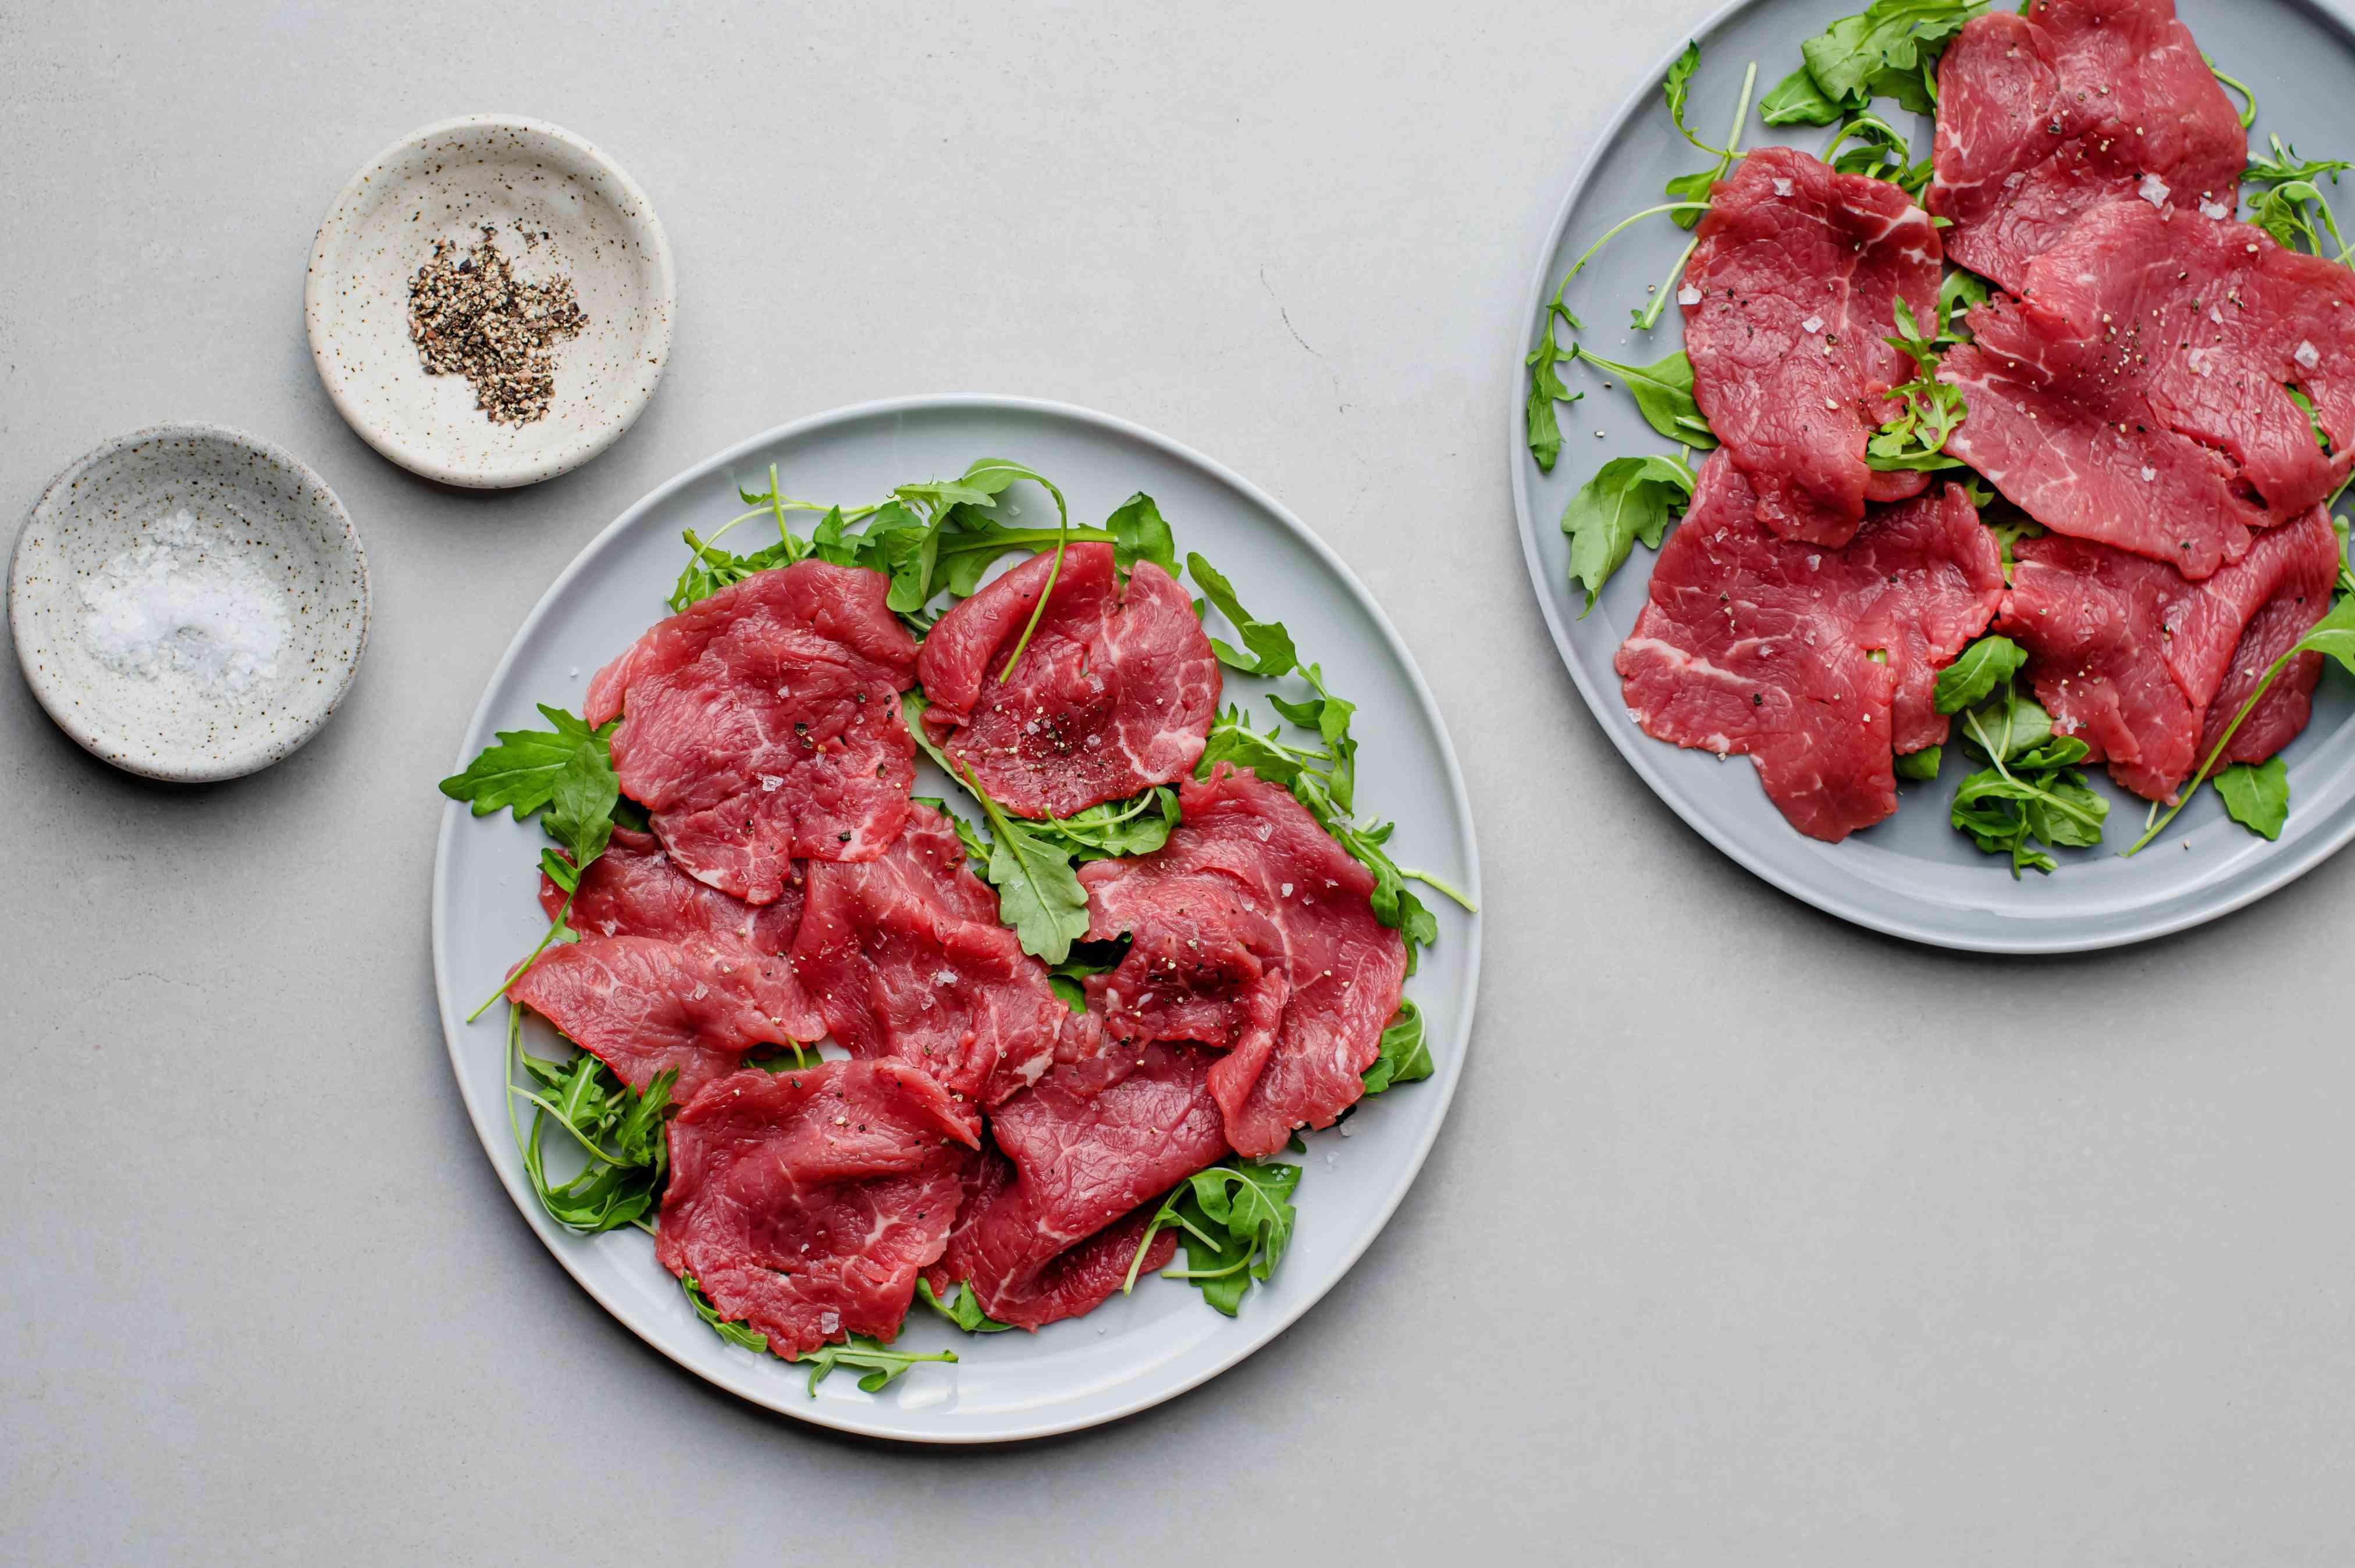 carpaccio meat on a pate of arugula